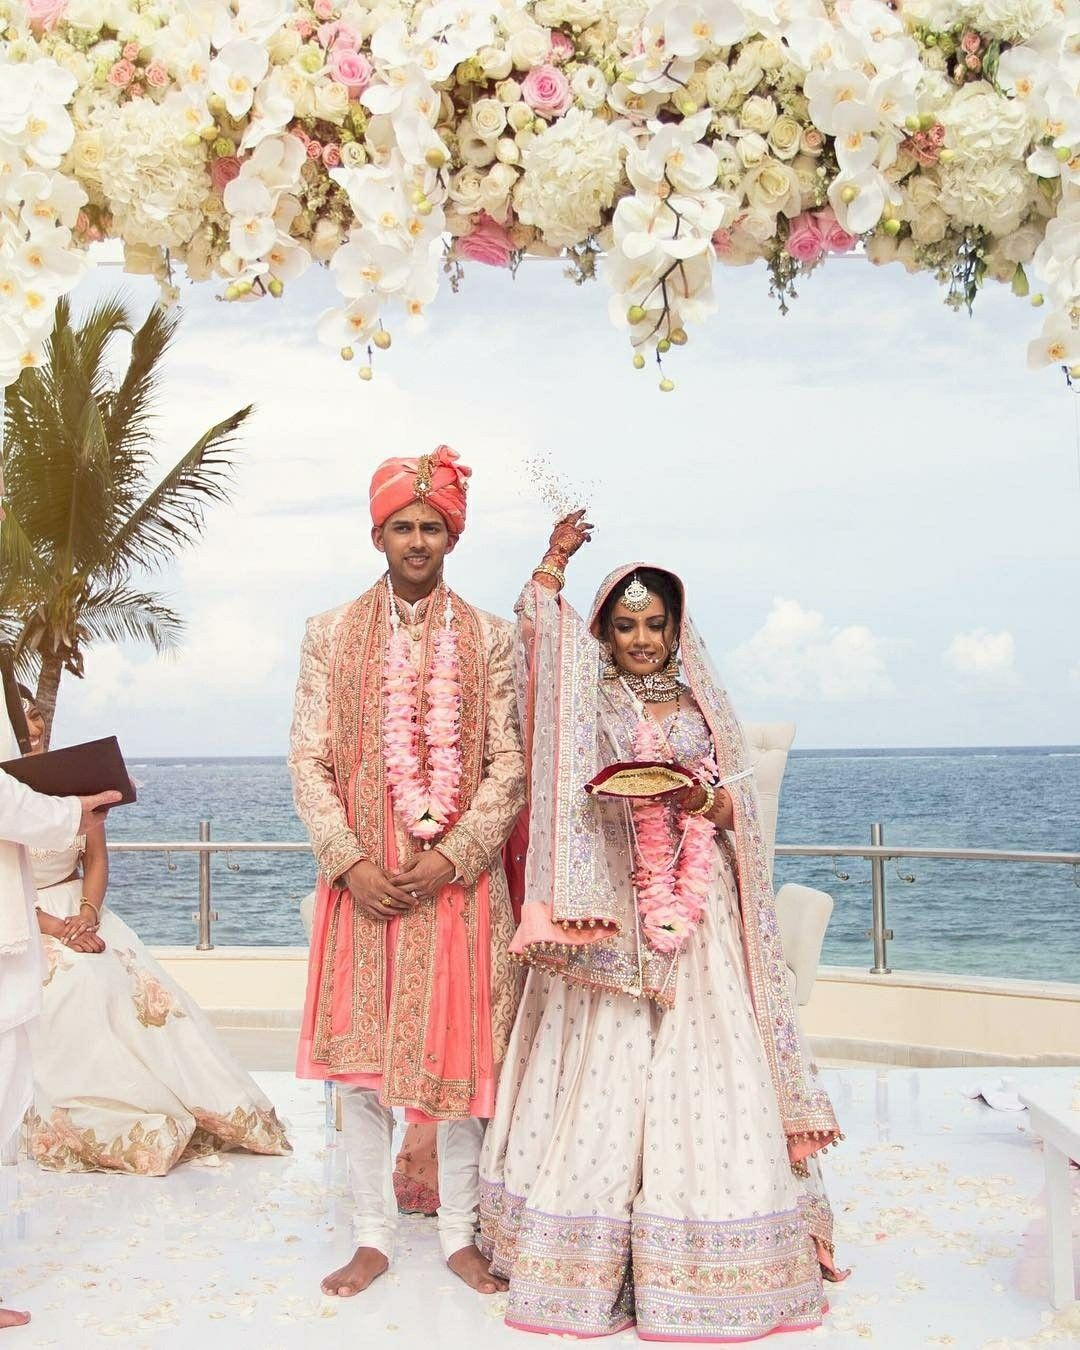 c23de15ef8 Indian beach wedding   Indian things in 2019   Indian beach wedding ...